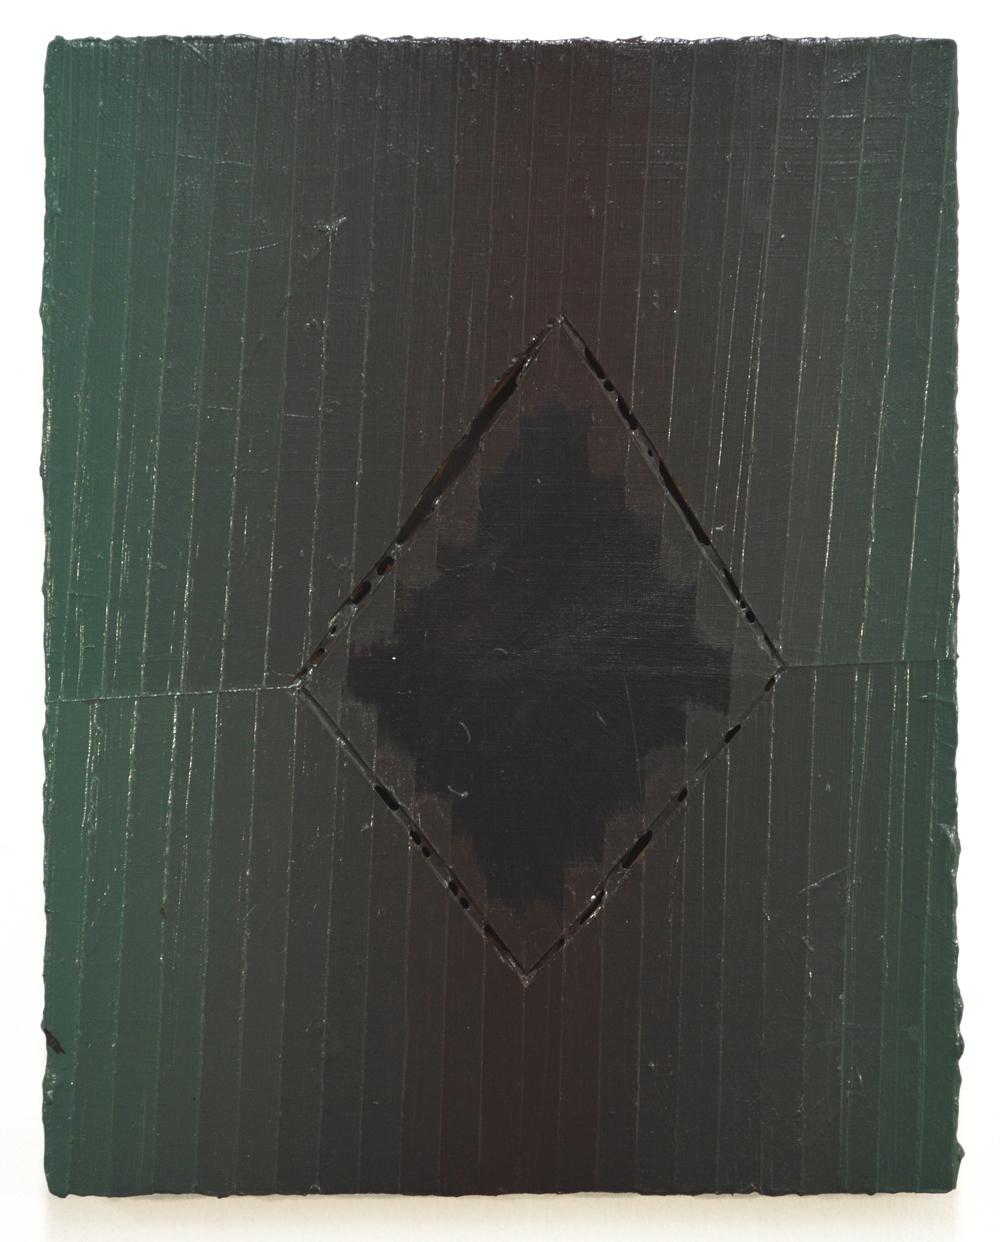 "Rafael Vega   Untitled,  2014   Acrylic on hardboard   14"" x 11""   Retail Value: $1,800   Opening Bid: $900"